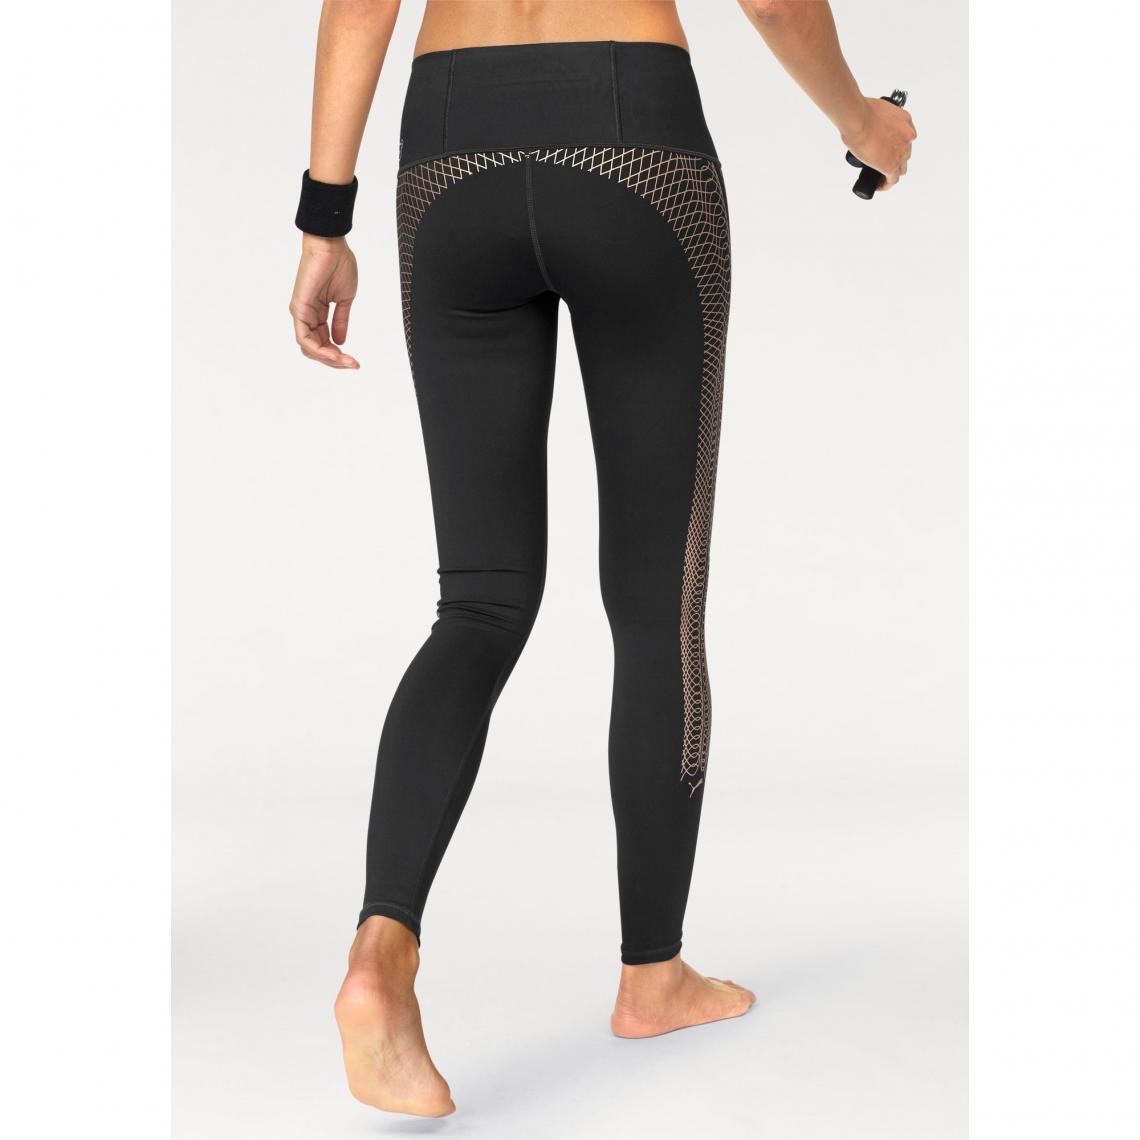 d73342173e Legging sport femme Every Day Train Graphic Tight Puma - Noir | 3 ...